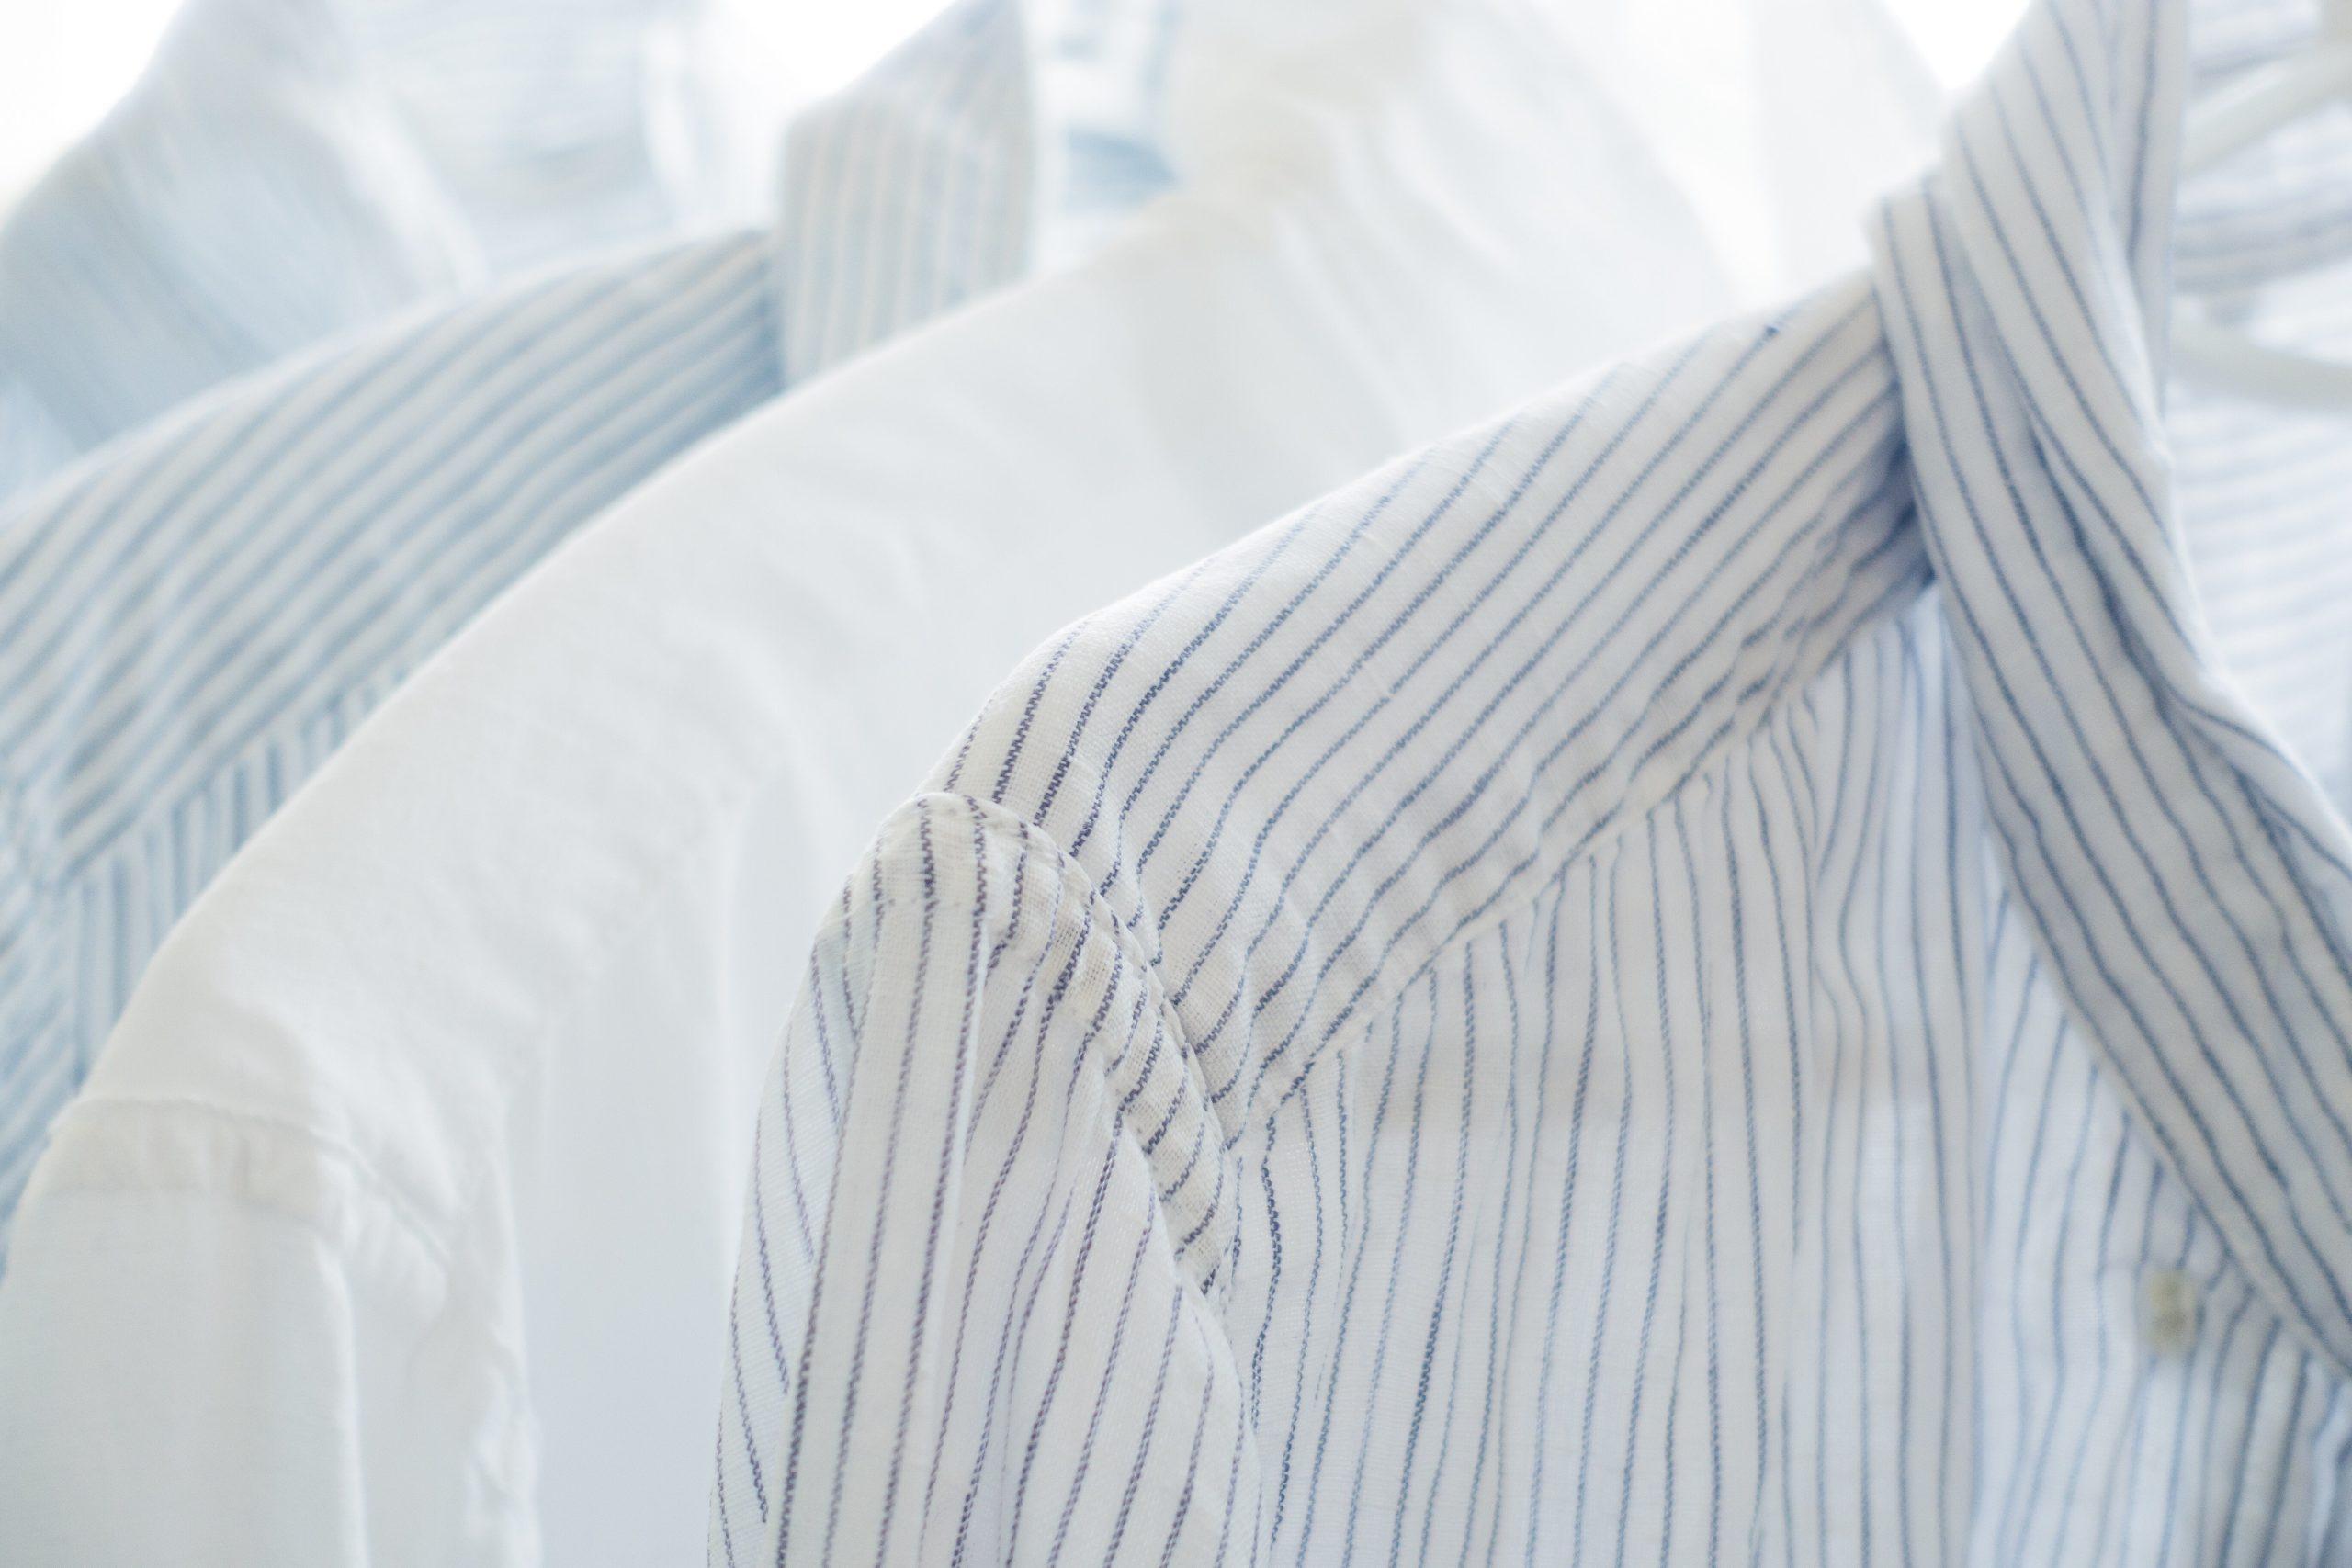 Reasons to Choose Hemp Clothing